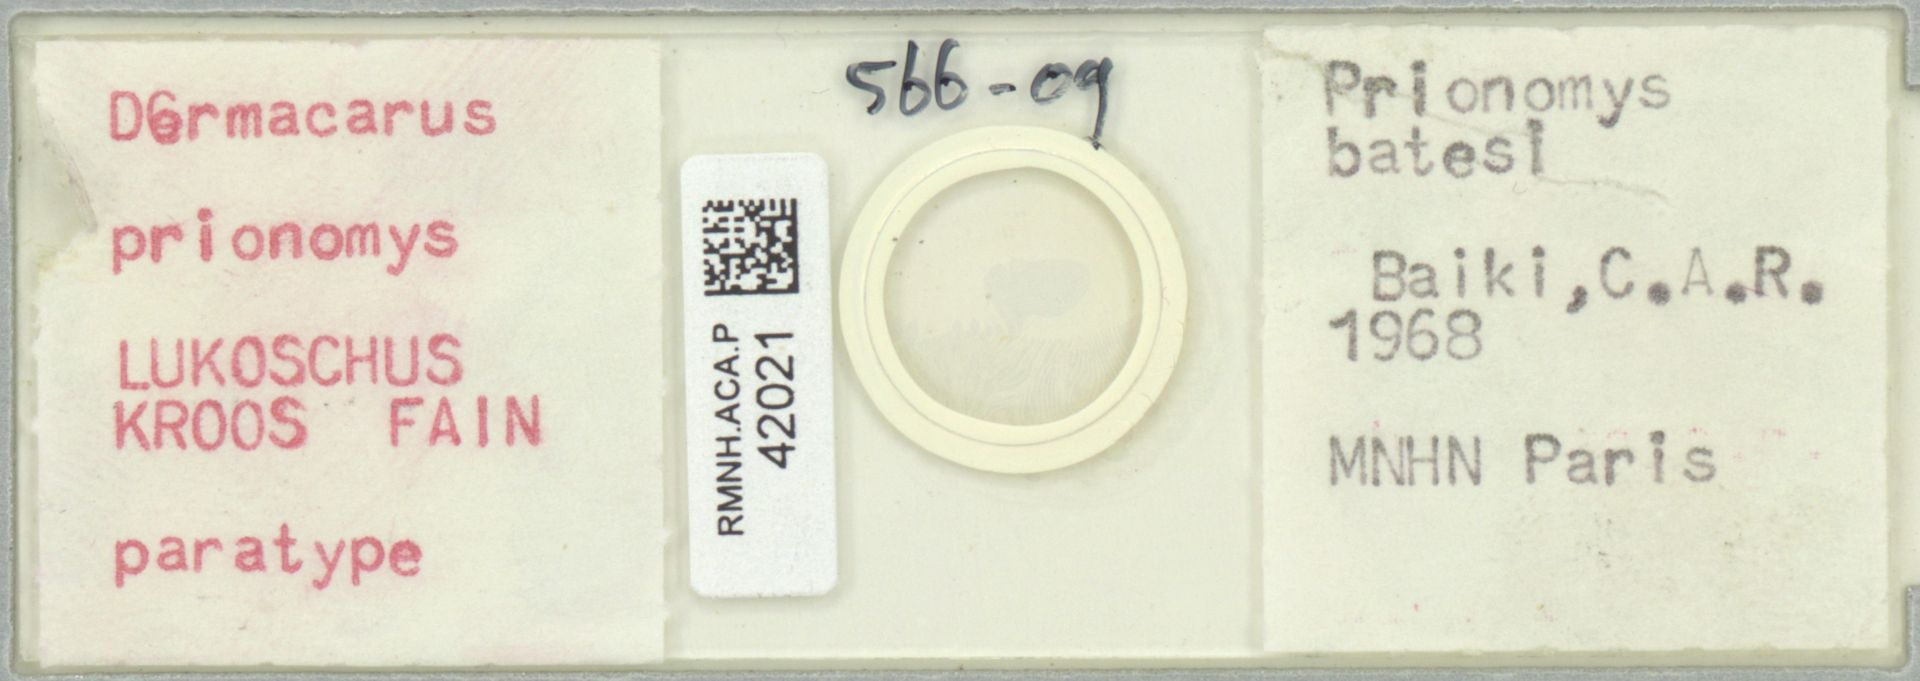 RMNH.ACA.P.42021   Dermacarus prionomys LUKOSCHUS KROOS FAIN